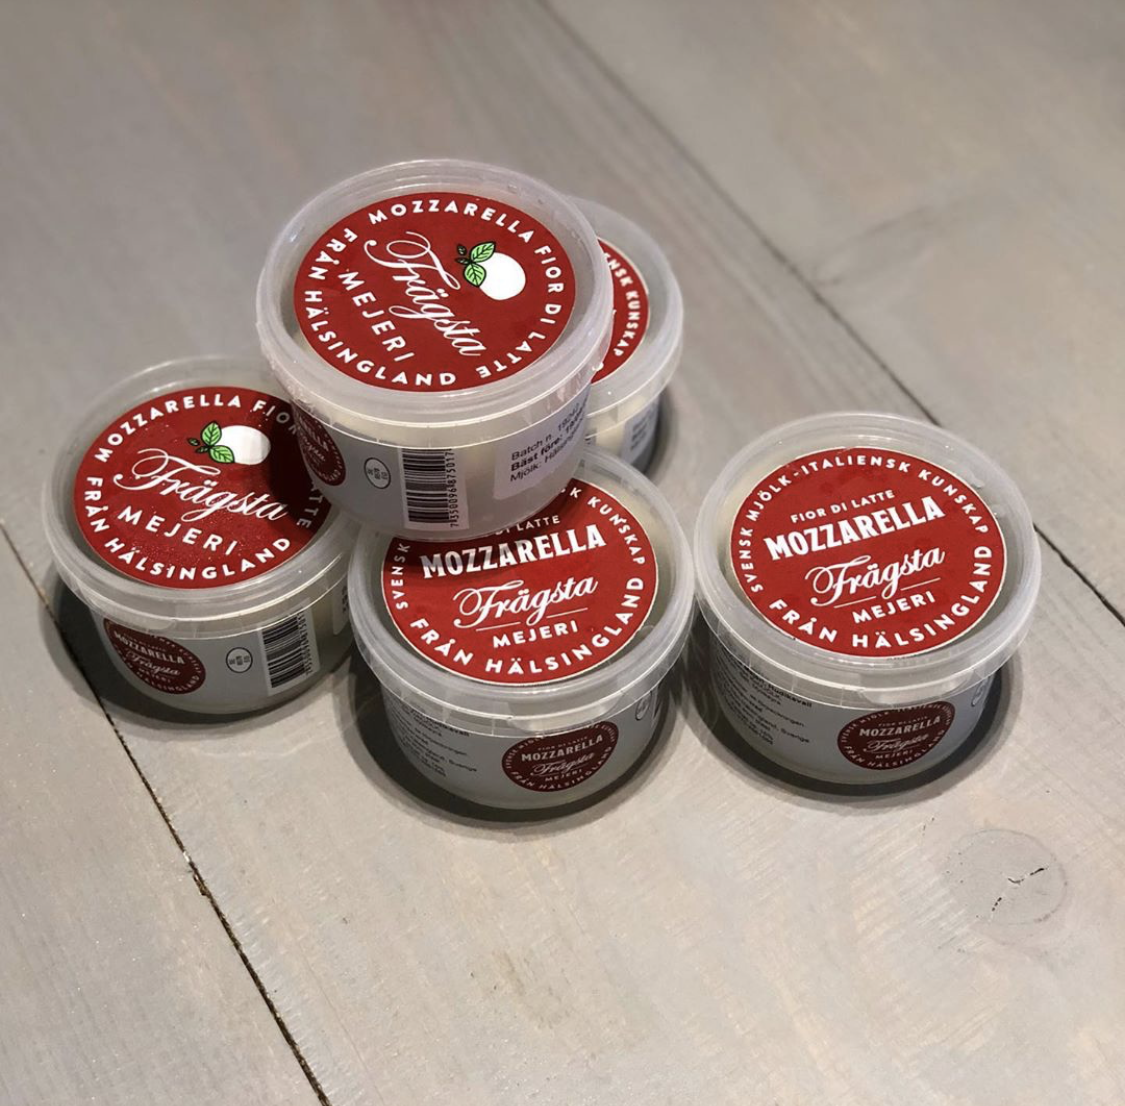 Mozzarella 125 g, Frägsta Mejeri